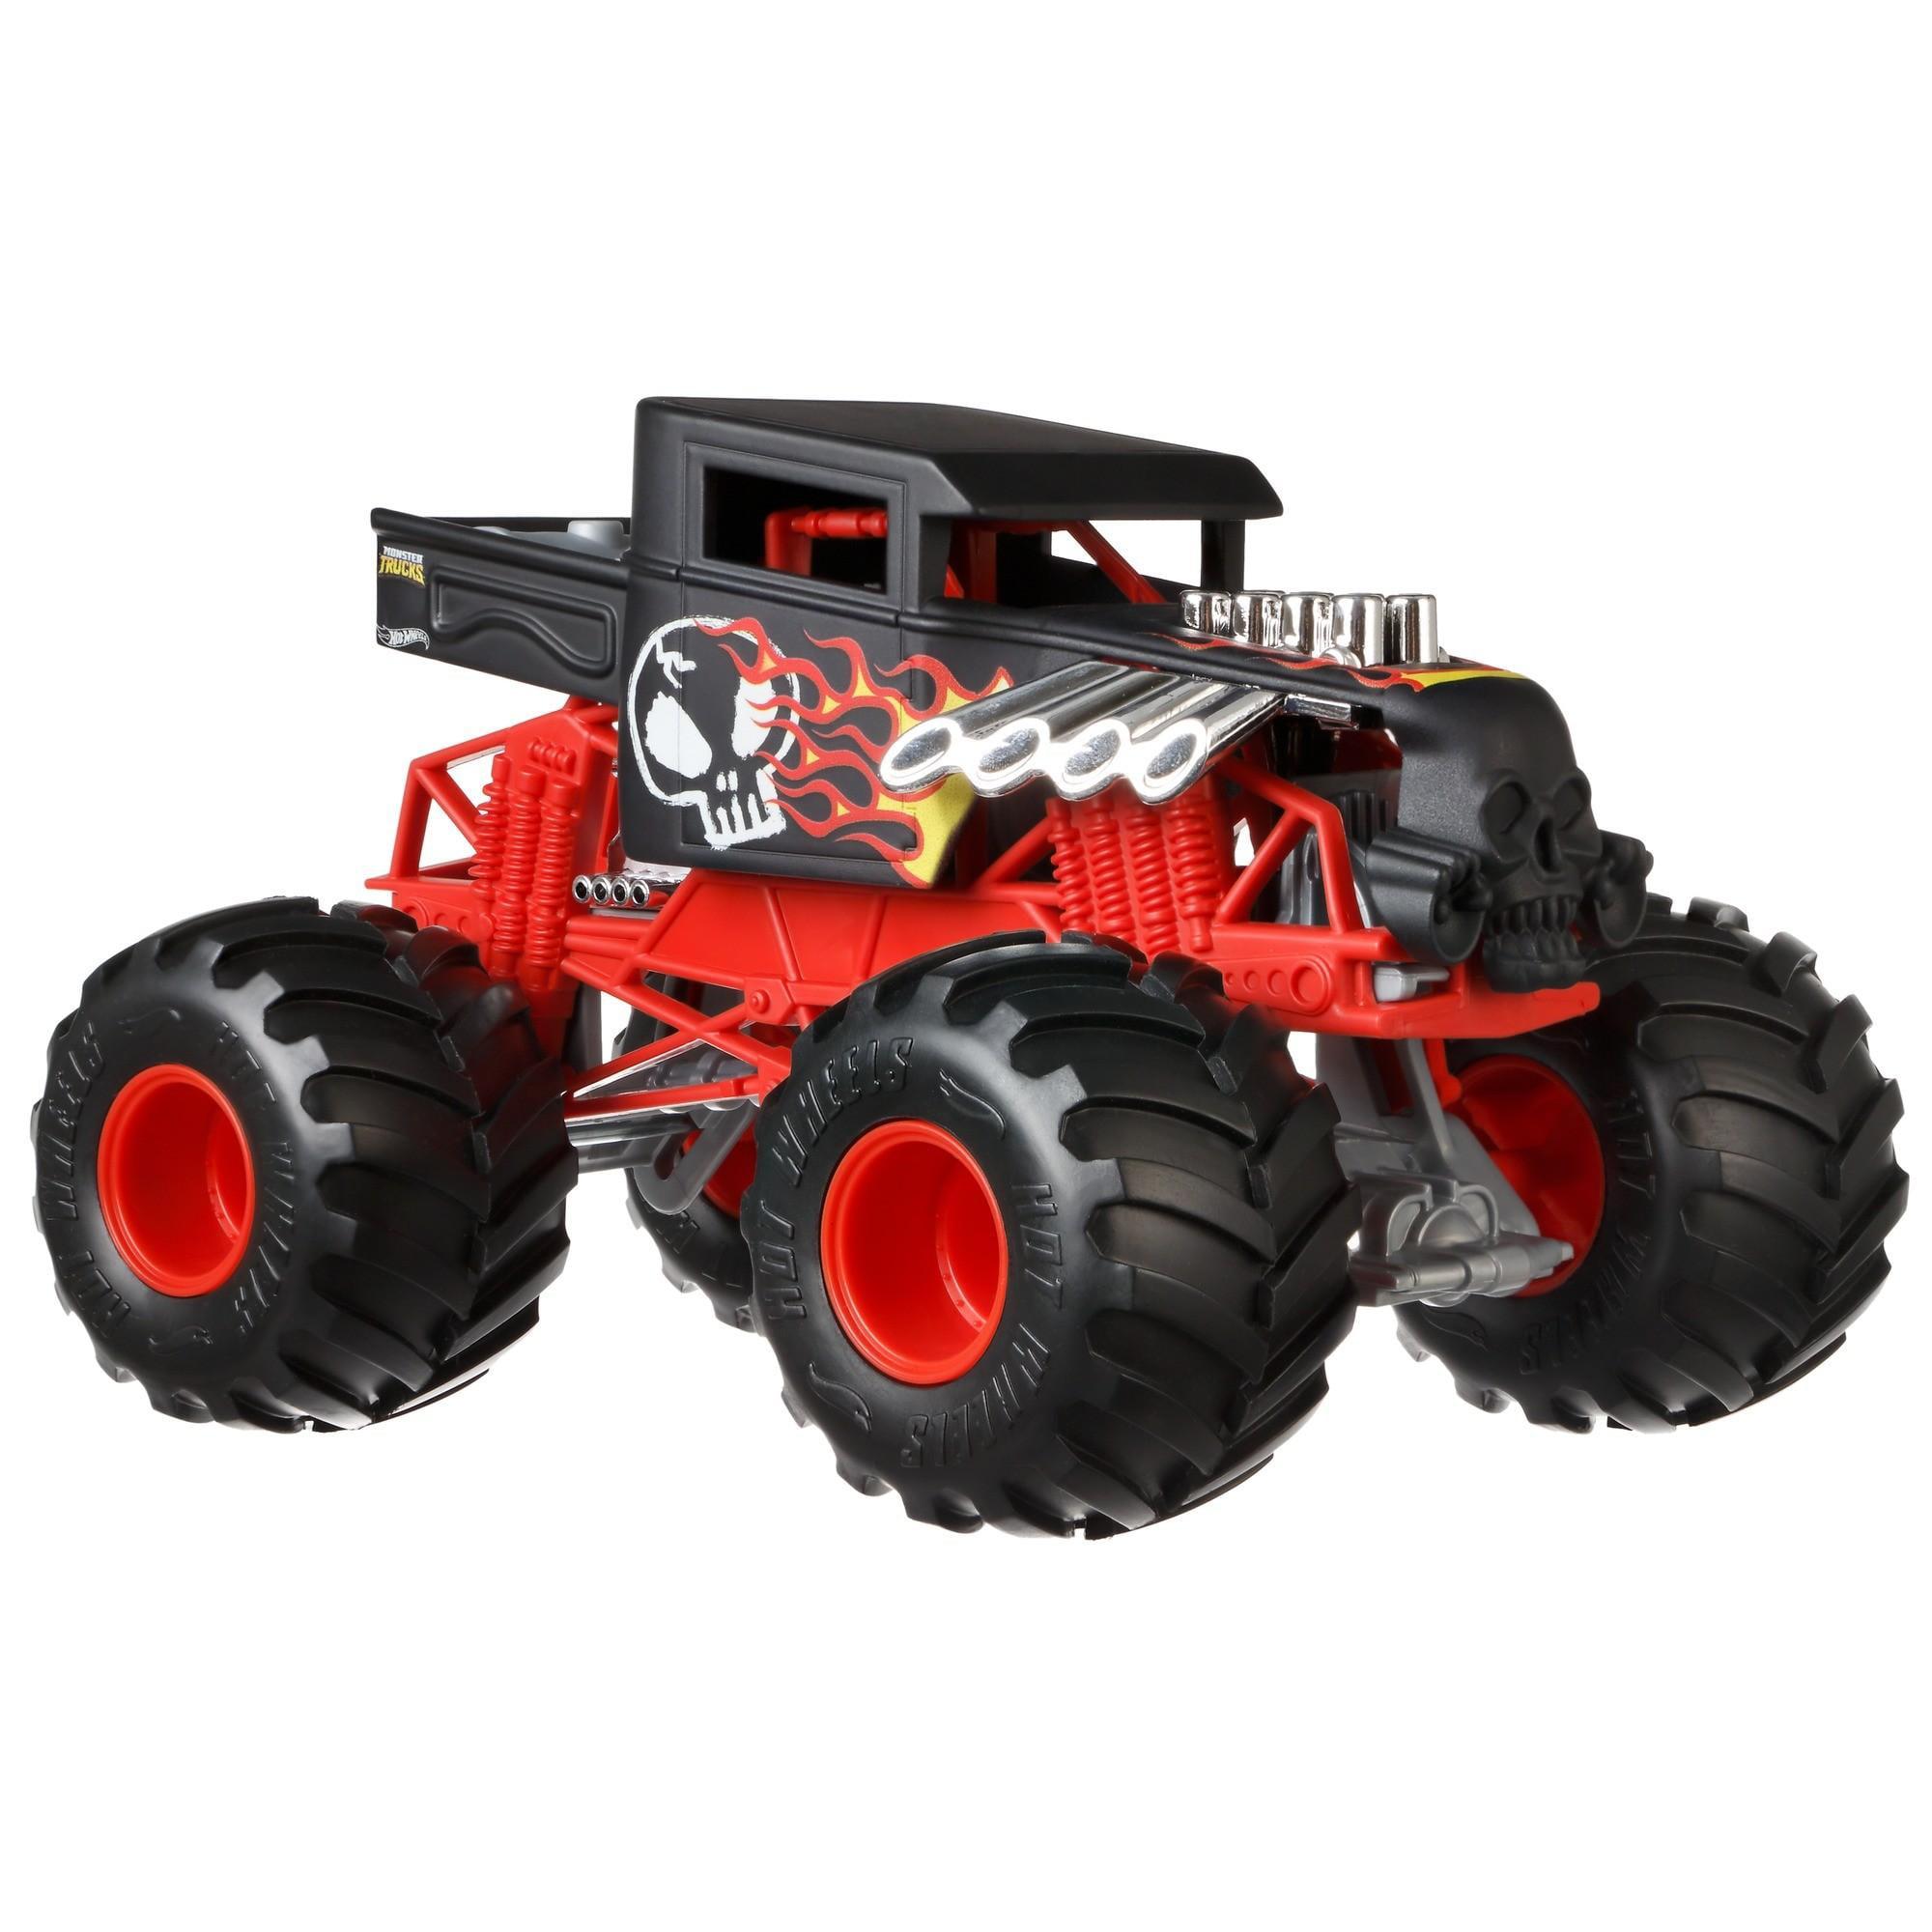 Hot Wheels Monster Trucks 1:24 Scale Bone Shaker by Mattel